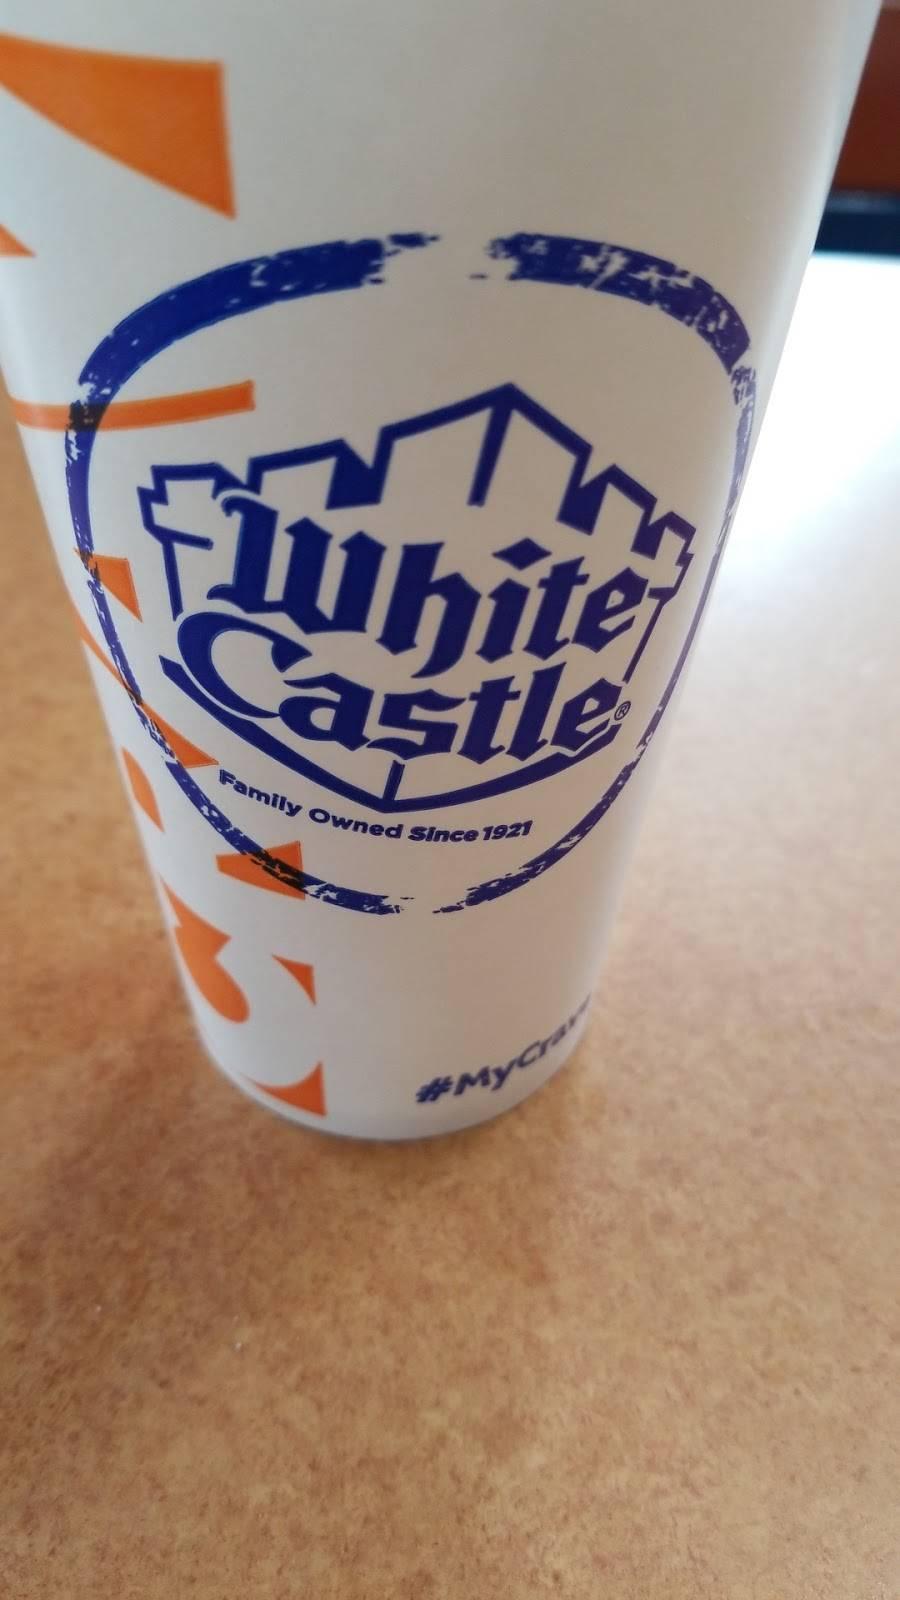 White Castle   restaurant   3101 Atlantic Ave, Brooklyn, NY 11208, USA   7188276057 OR +1 718-827-6057